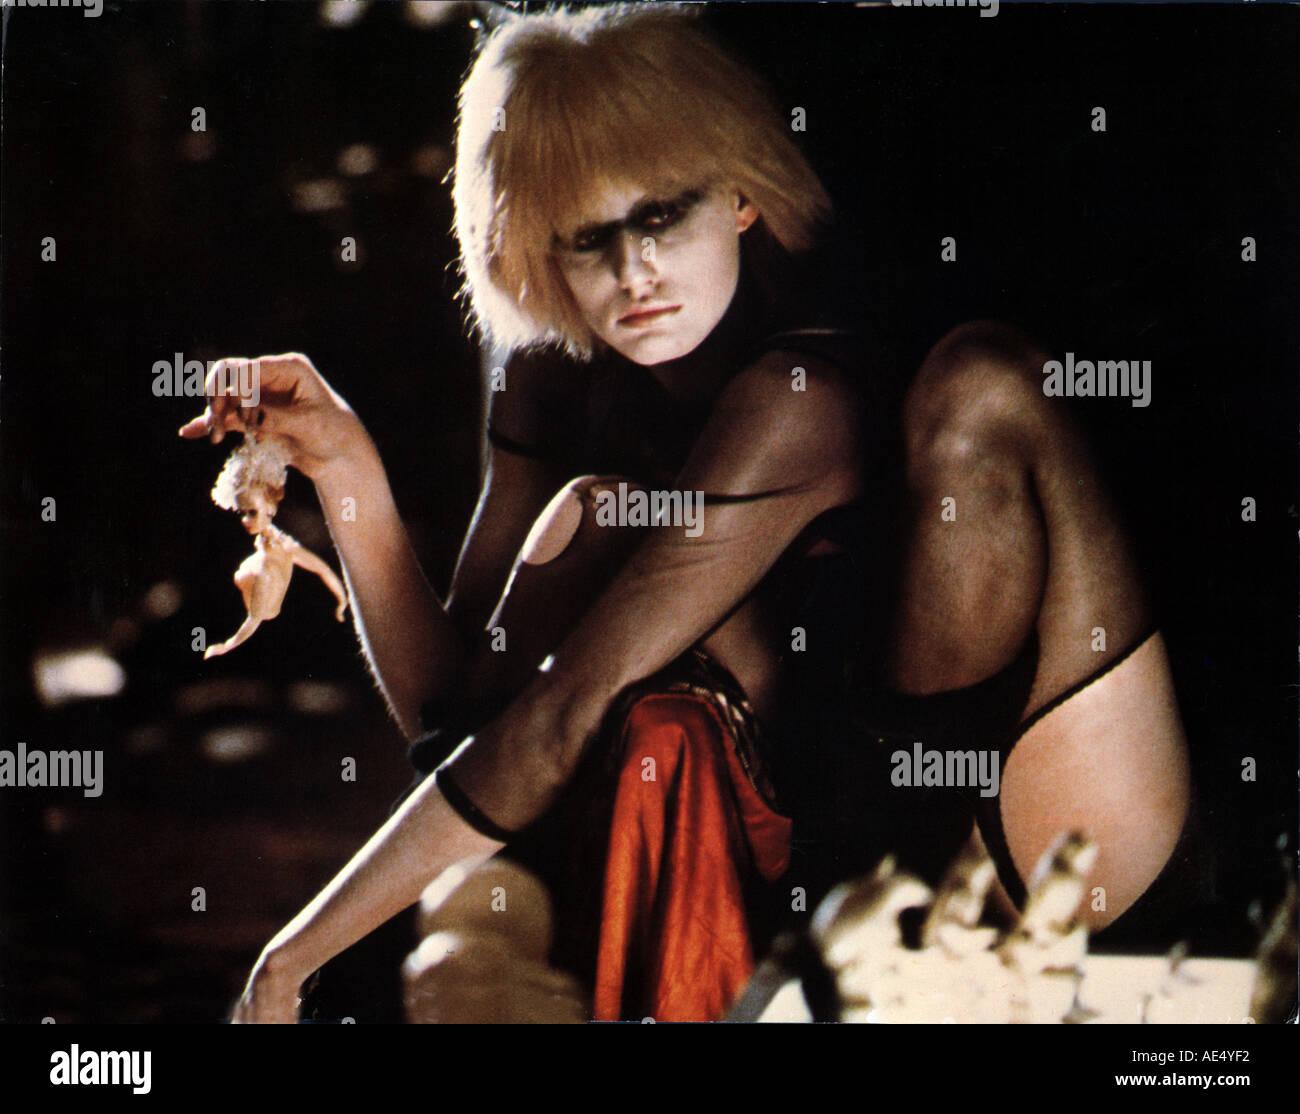 BLADE RUNNER Daryl Hannah the 1982 film - Stock Image